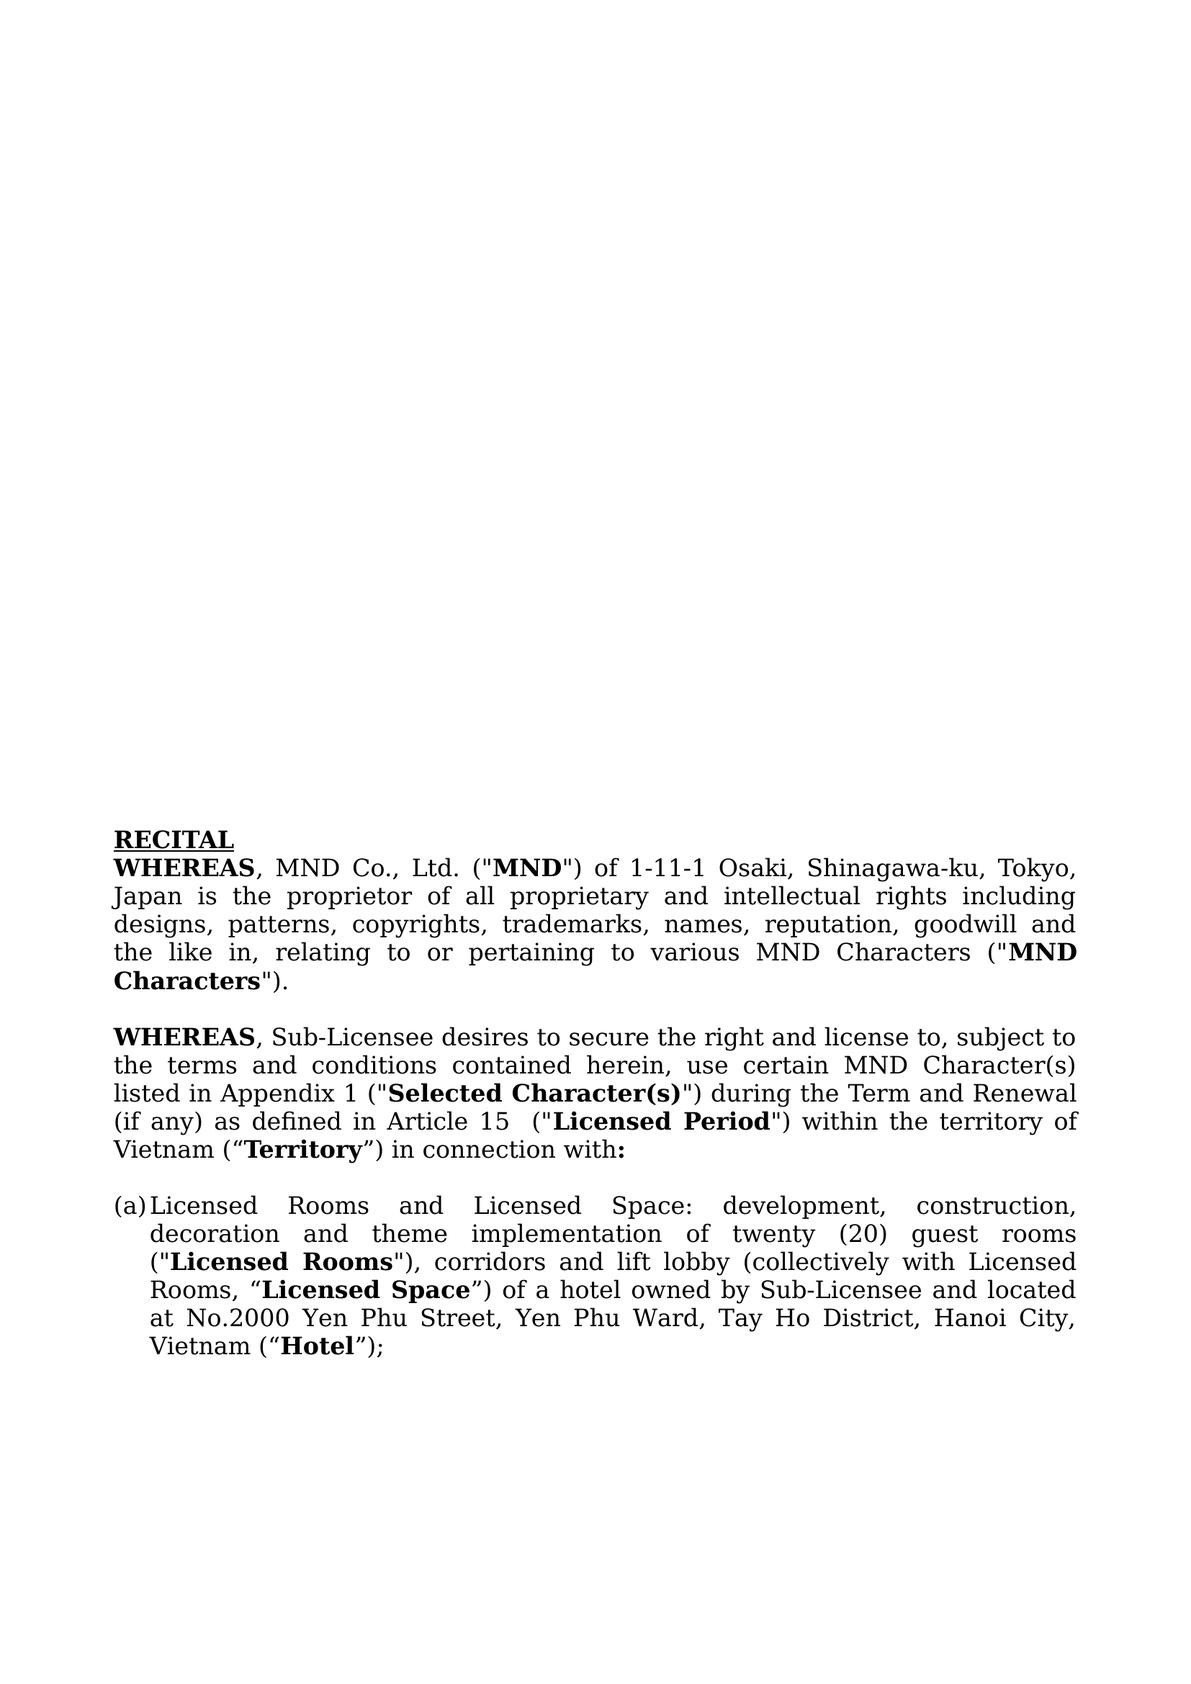 Sub License Agreement for theme park-0